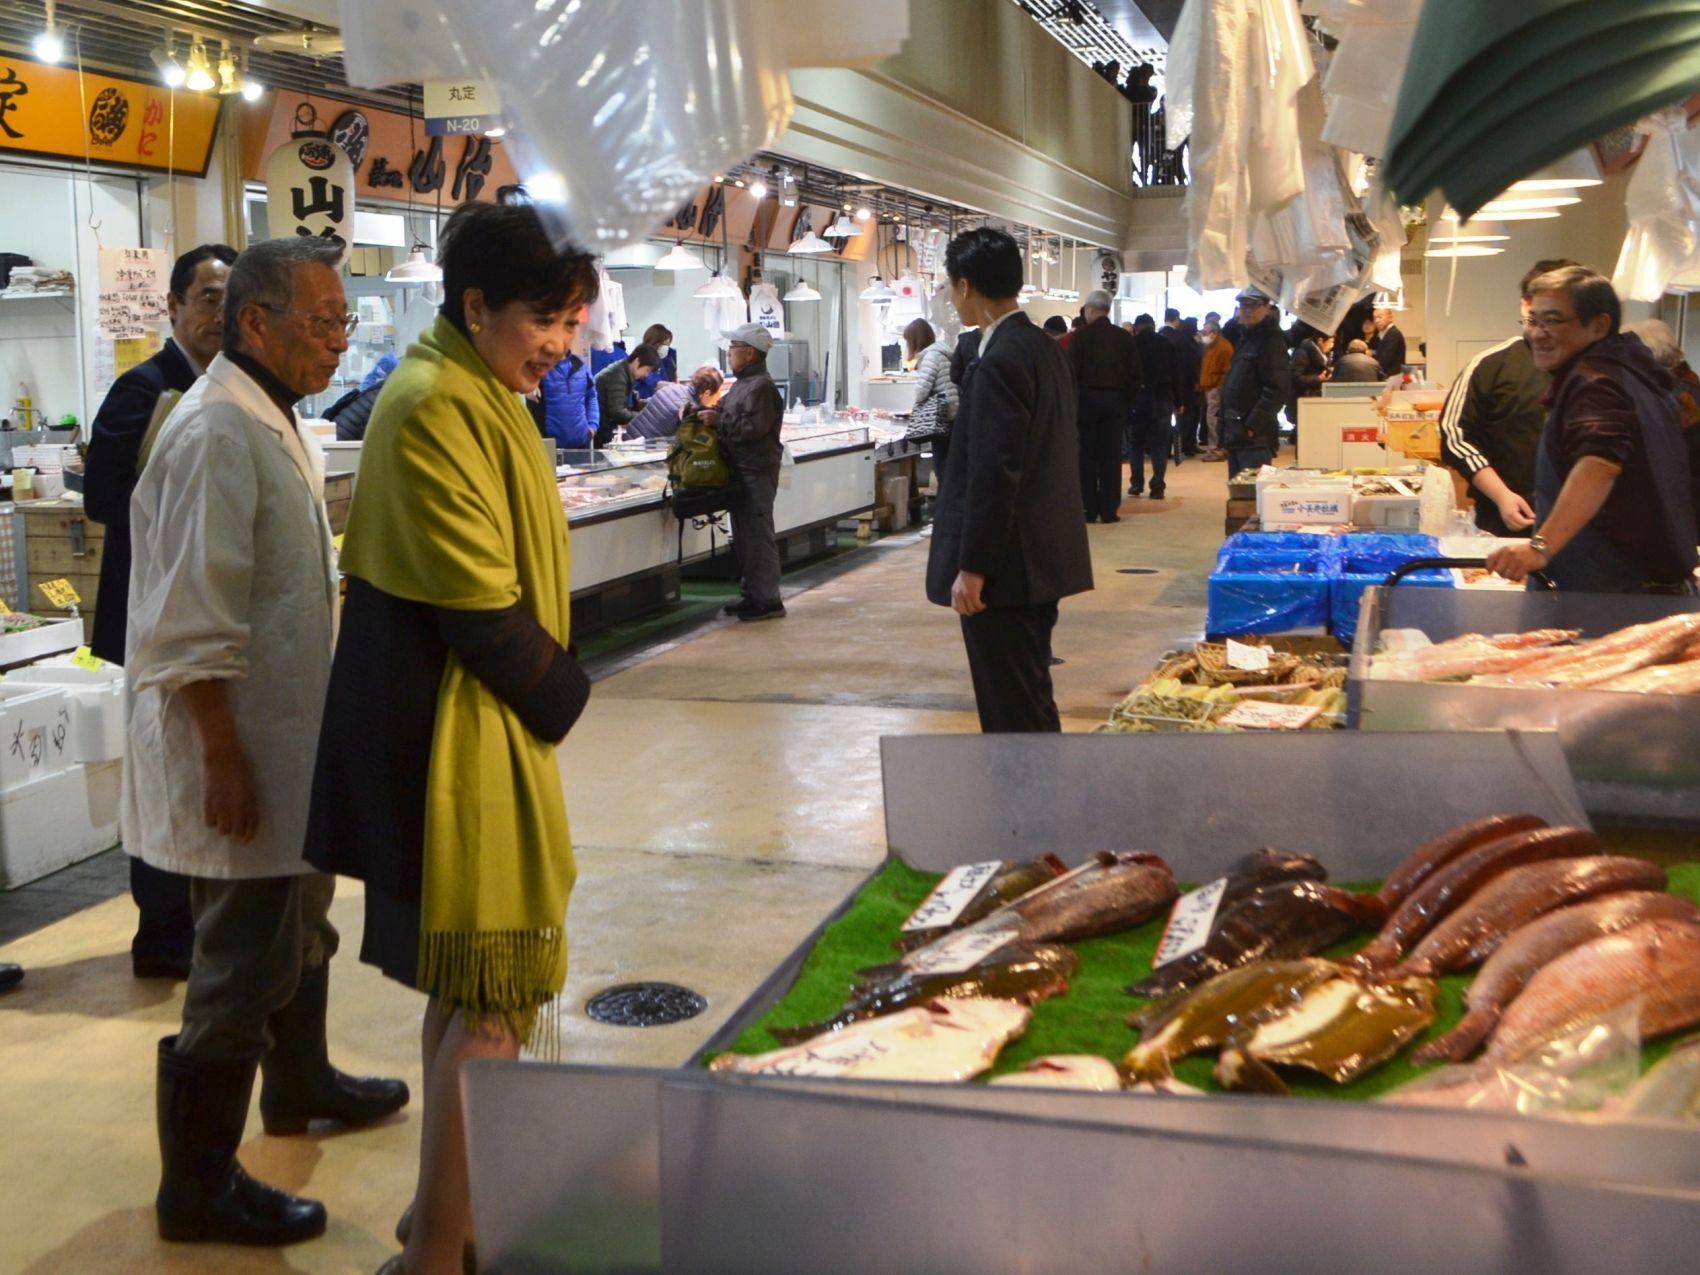 INTERVIEW | Governor Yuriko Koike Promotes Prosperous Metropolis Beyond Tokyo Olympics and Paralympics